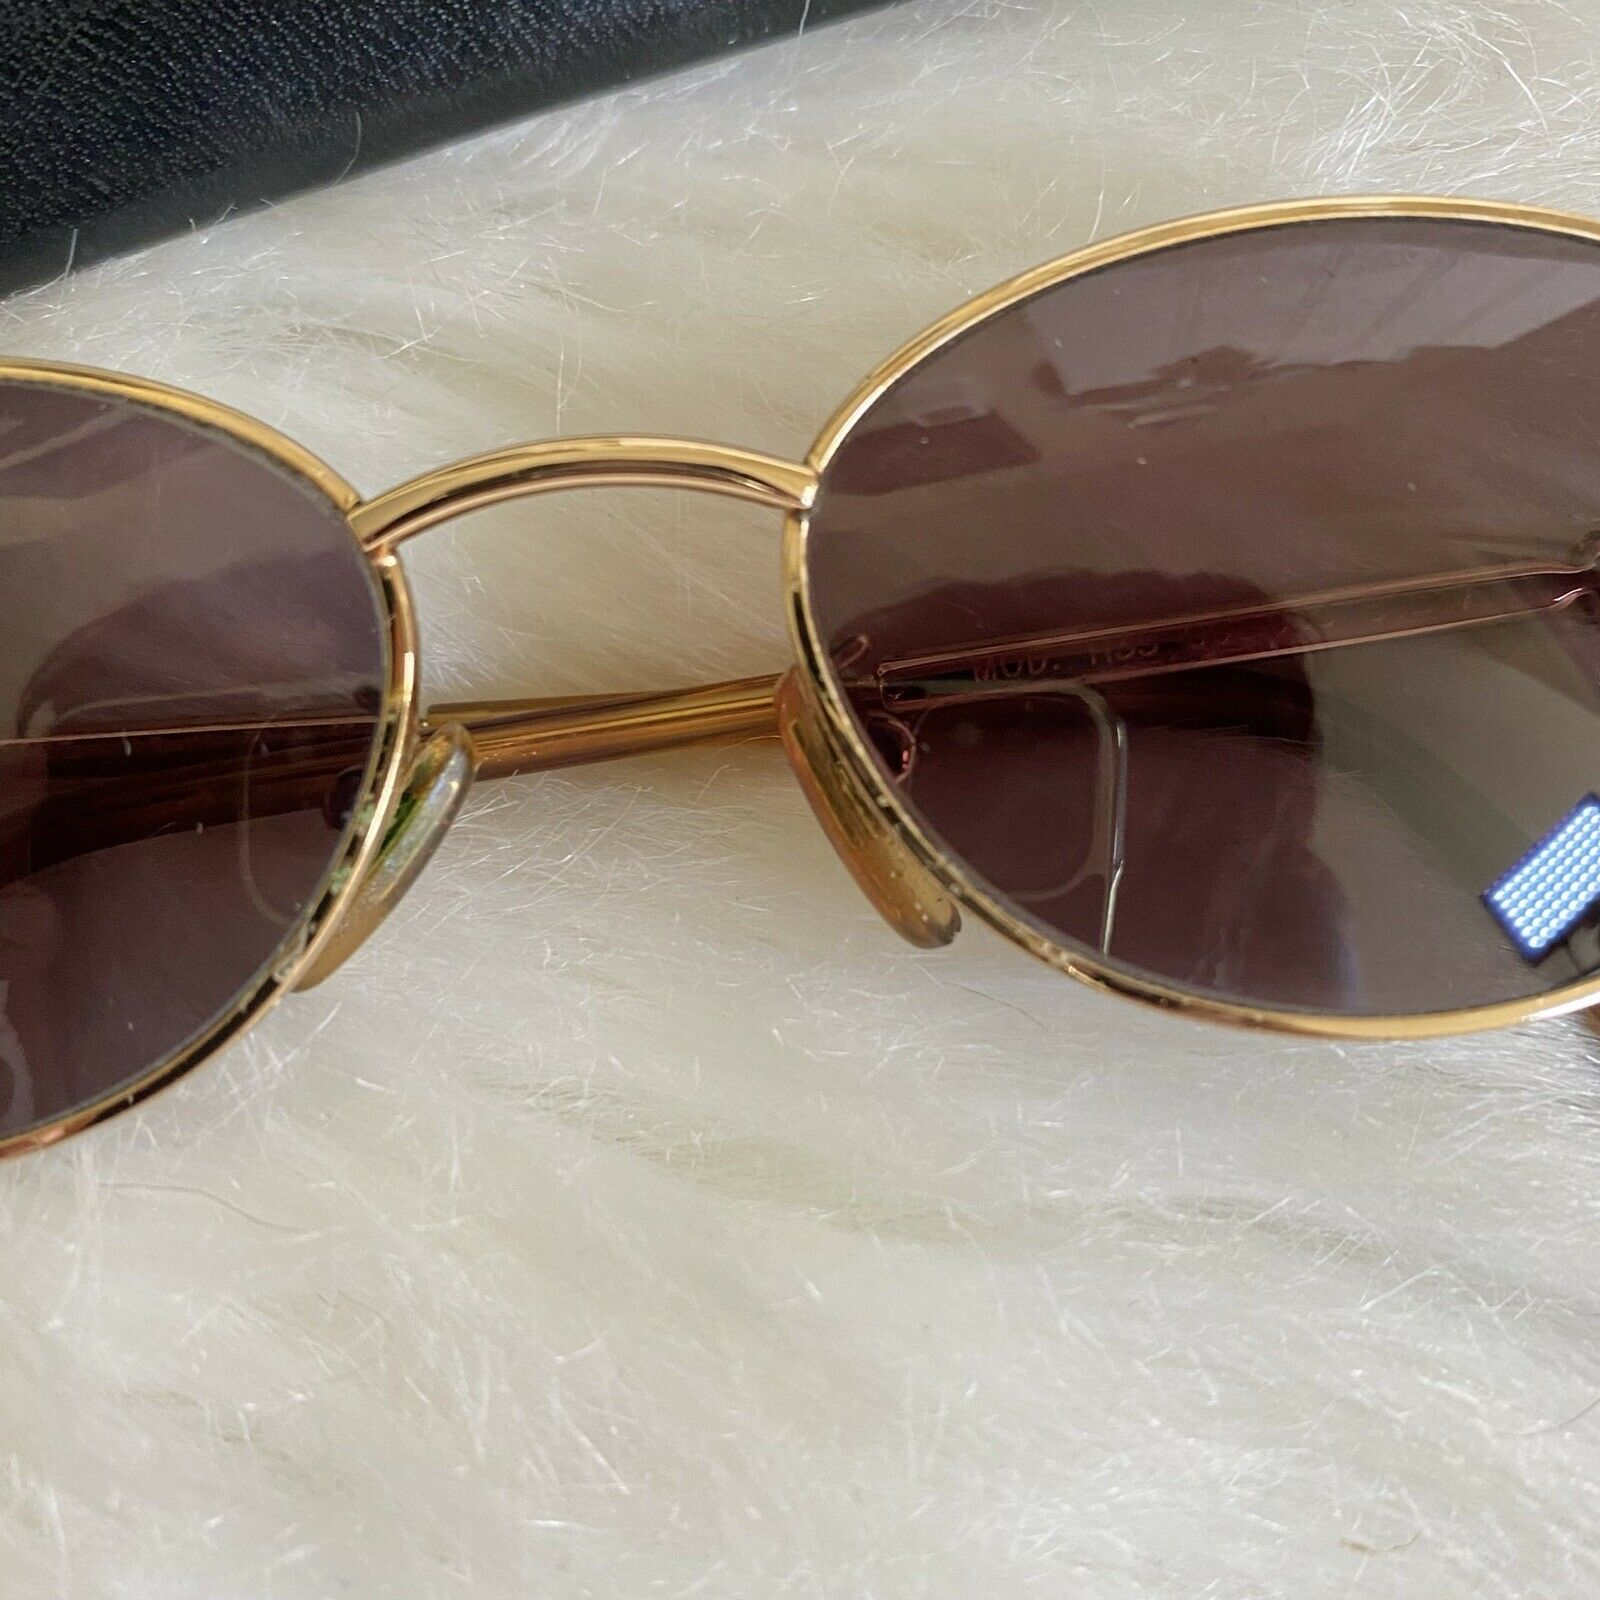 Vintage Gianni Versace Mod H35 COL 030 sunglasses - image 2